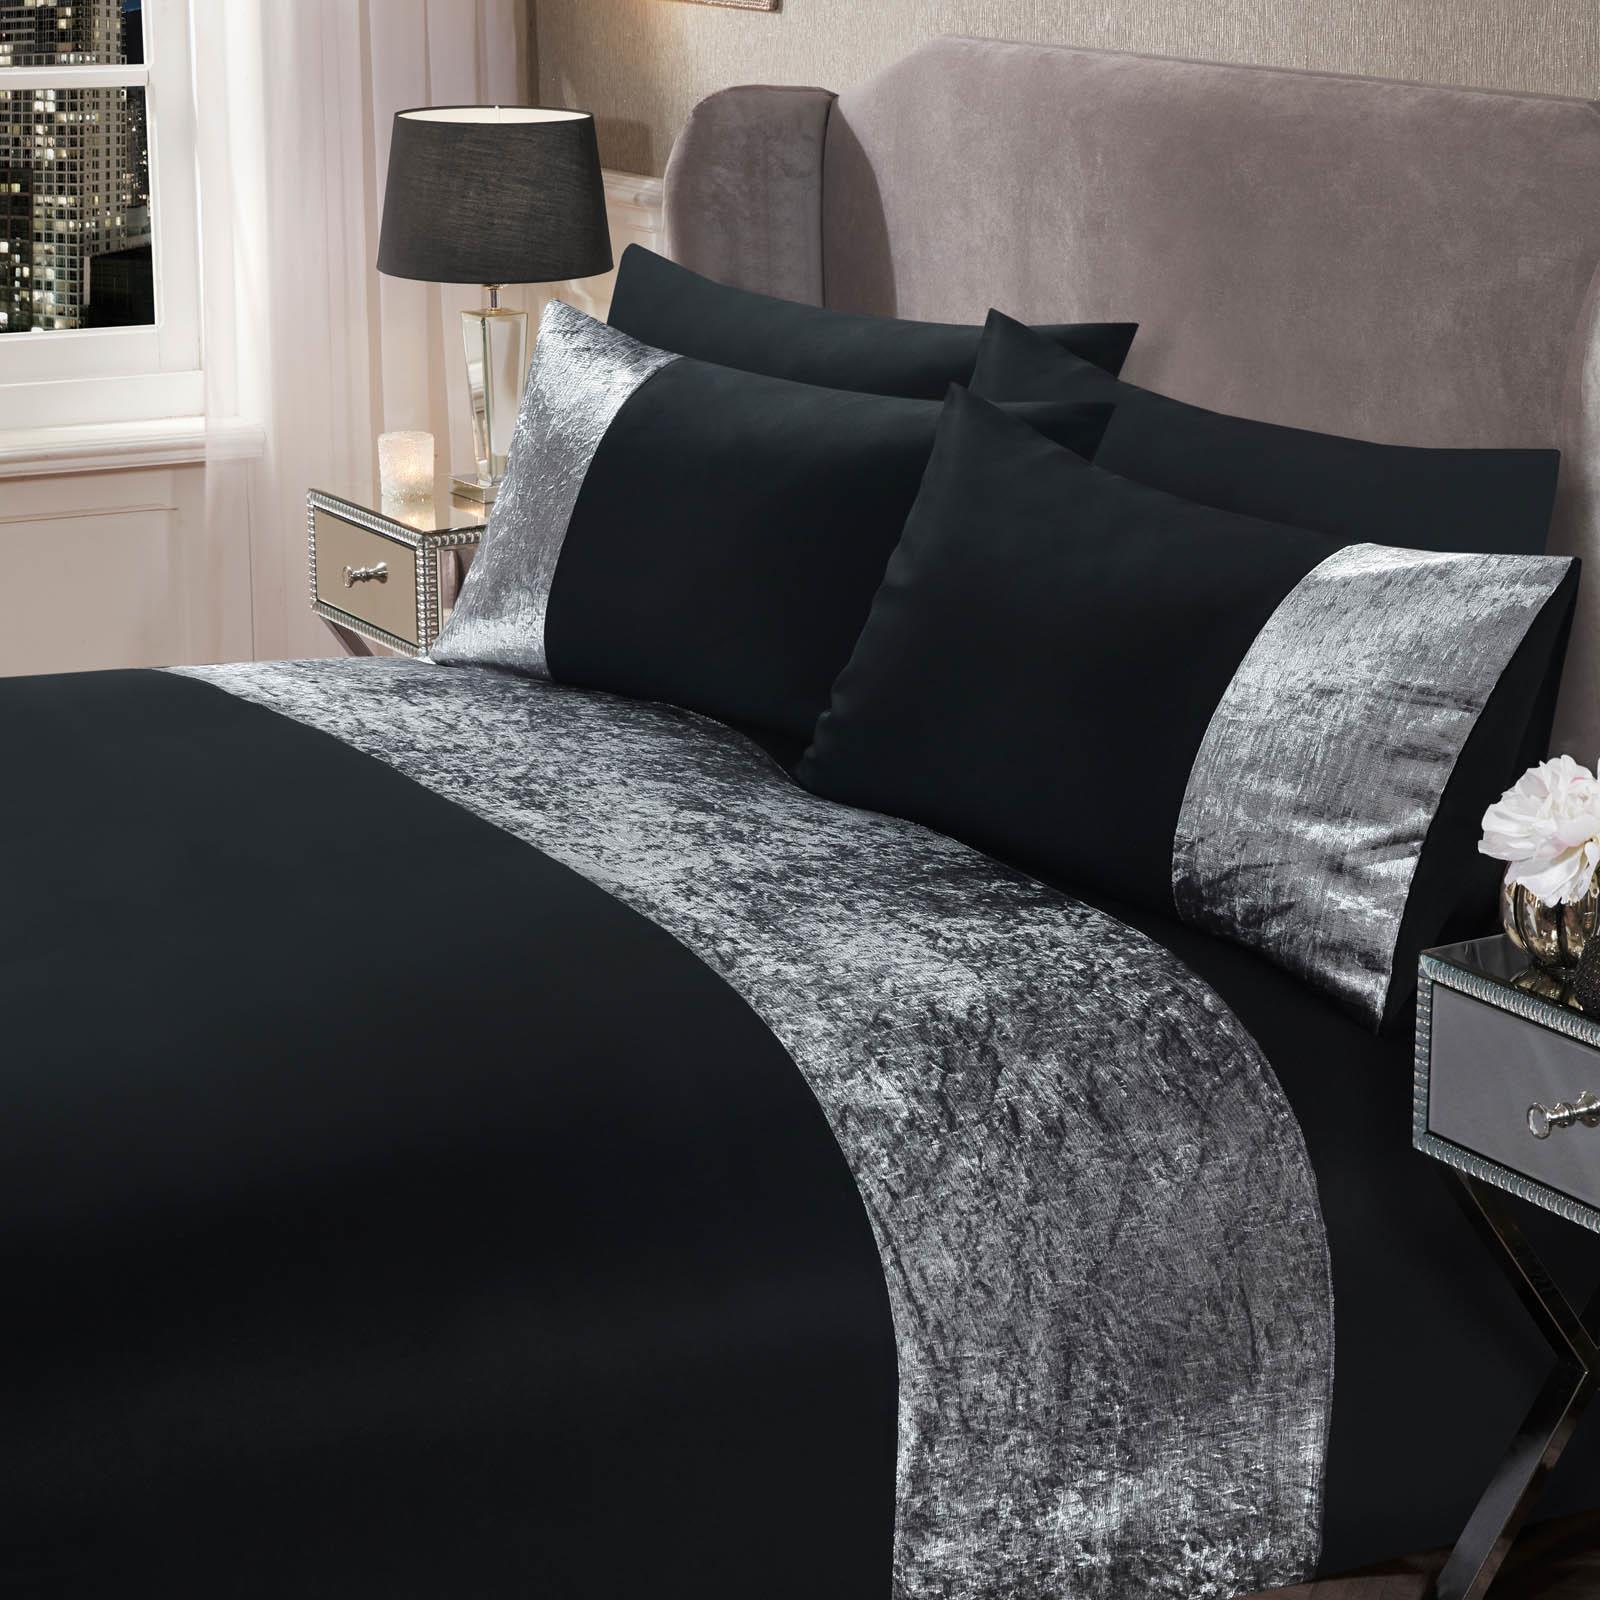 thumbnail 11 - Sienna Crushed Velvet Panel Duvet Cover with Pillow Case Bedding Set Silver Grey